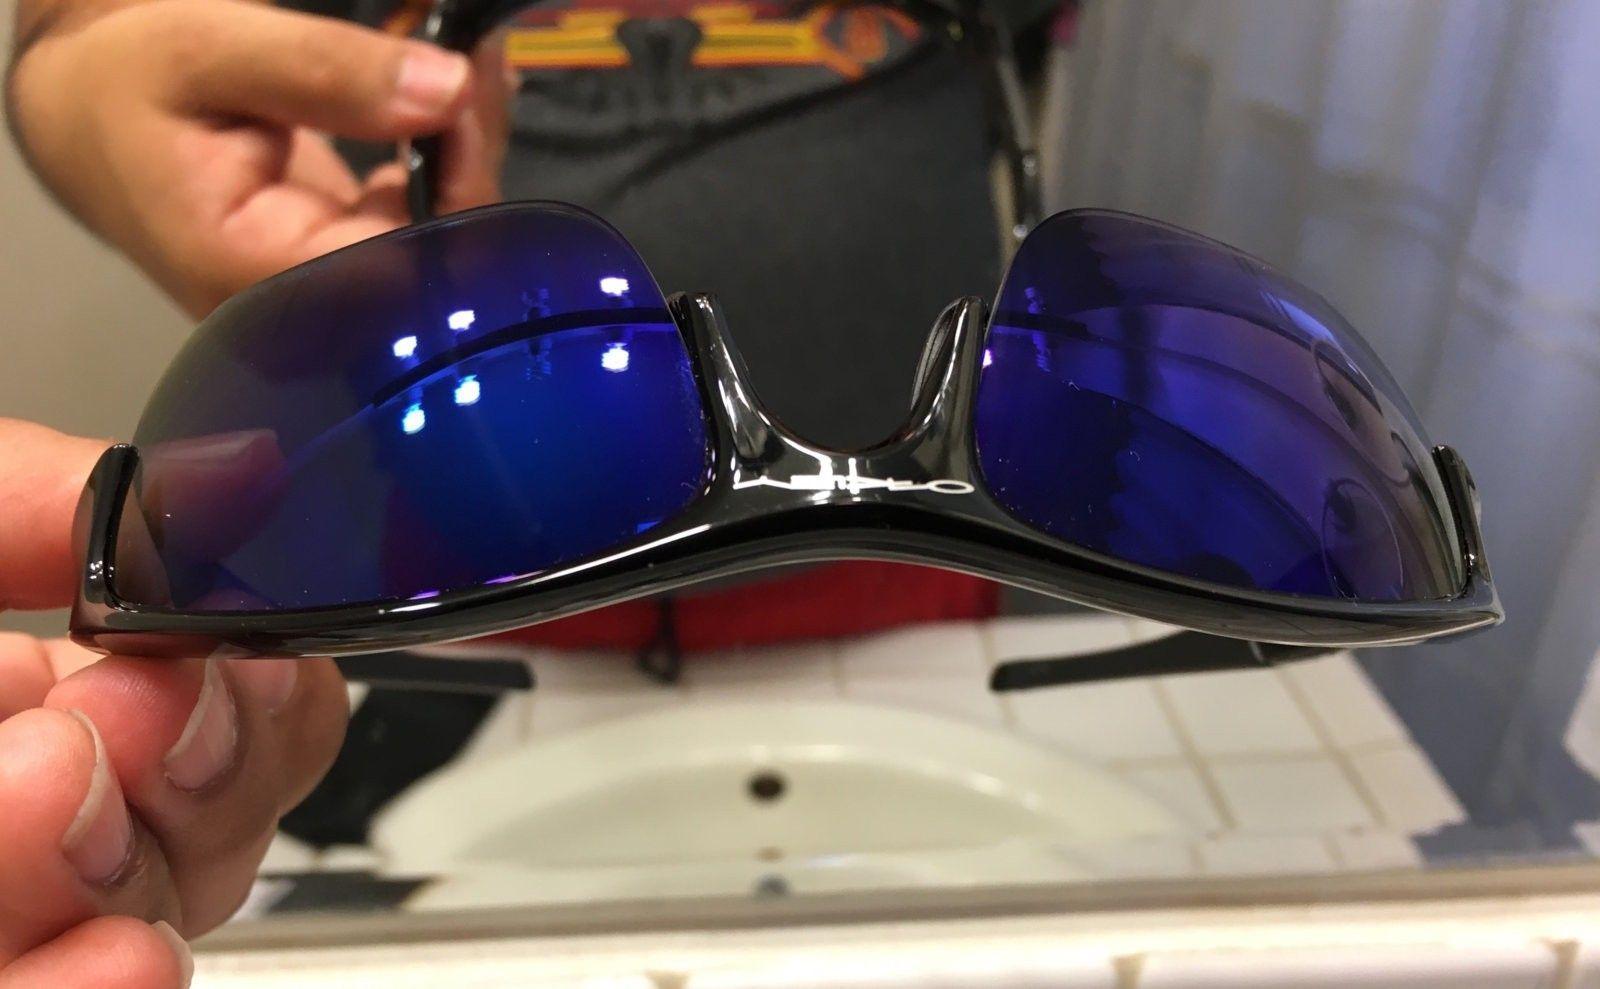 Flak Jacket 1.0 - 2 pairs - Polarized lenses - 2016-07-07 19.24.09.jpg